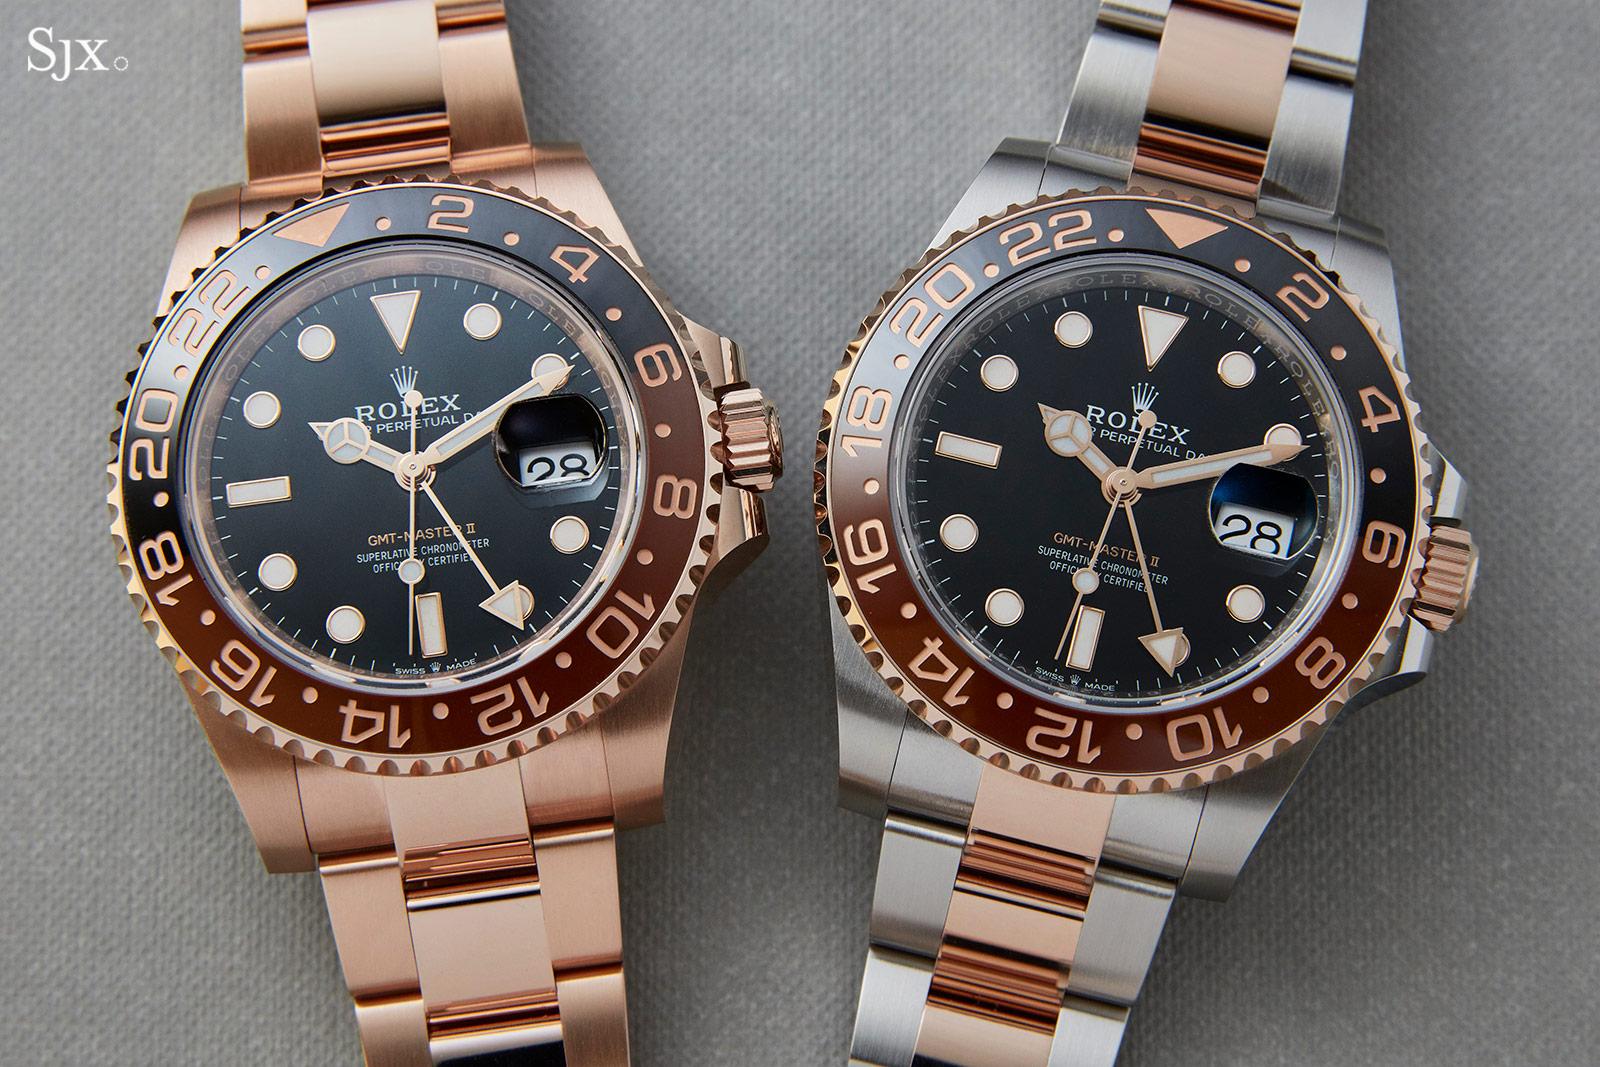 Thu mua đồng hồ Rolex tại TP.HCM